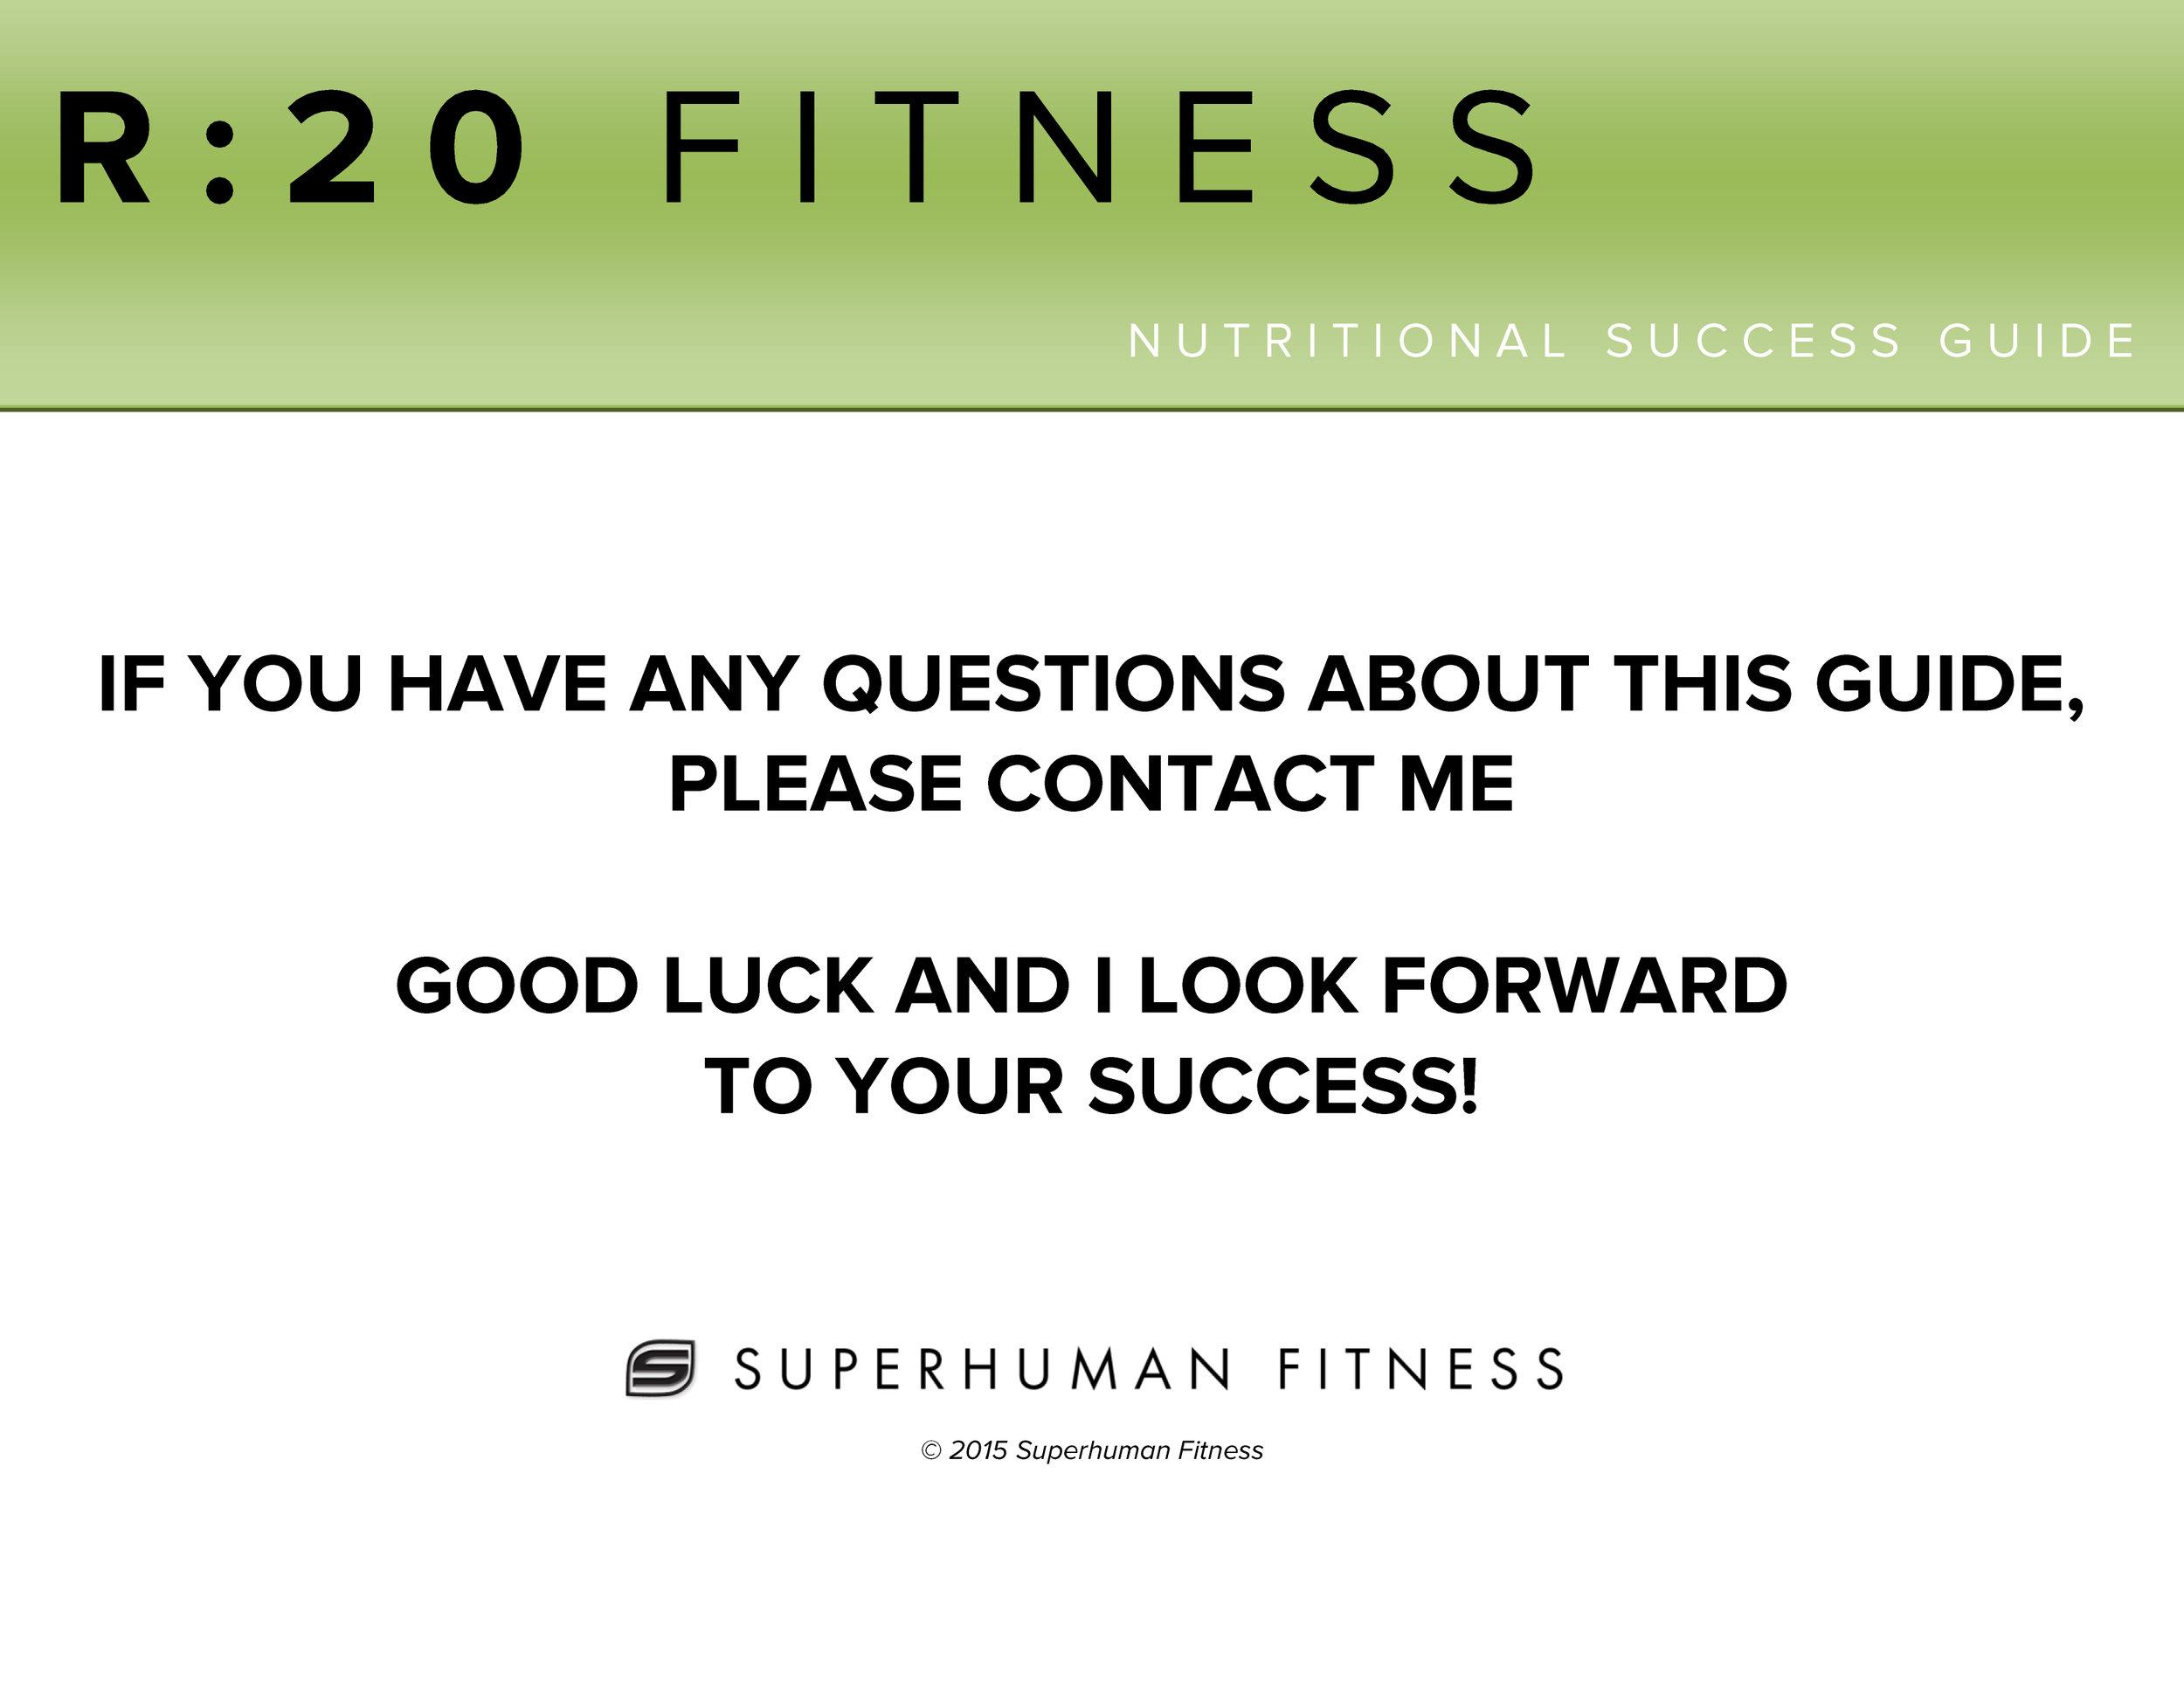 R20 1.0 Nutritional Success Guide-11.jpg